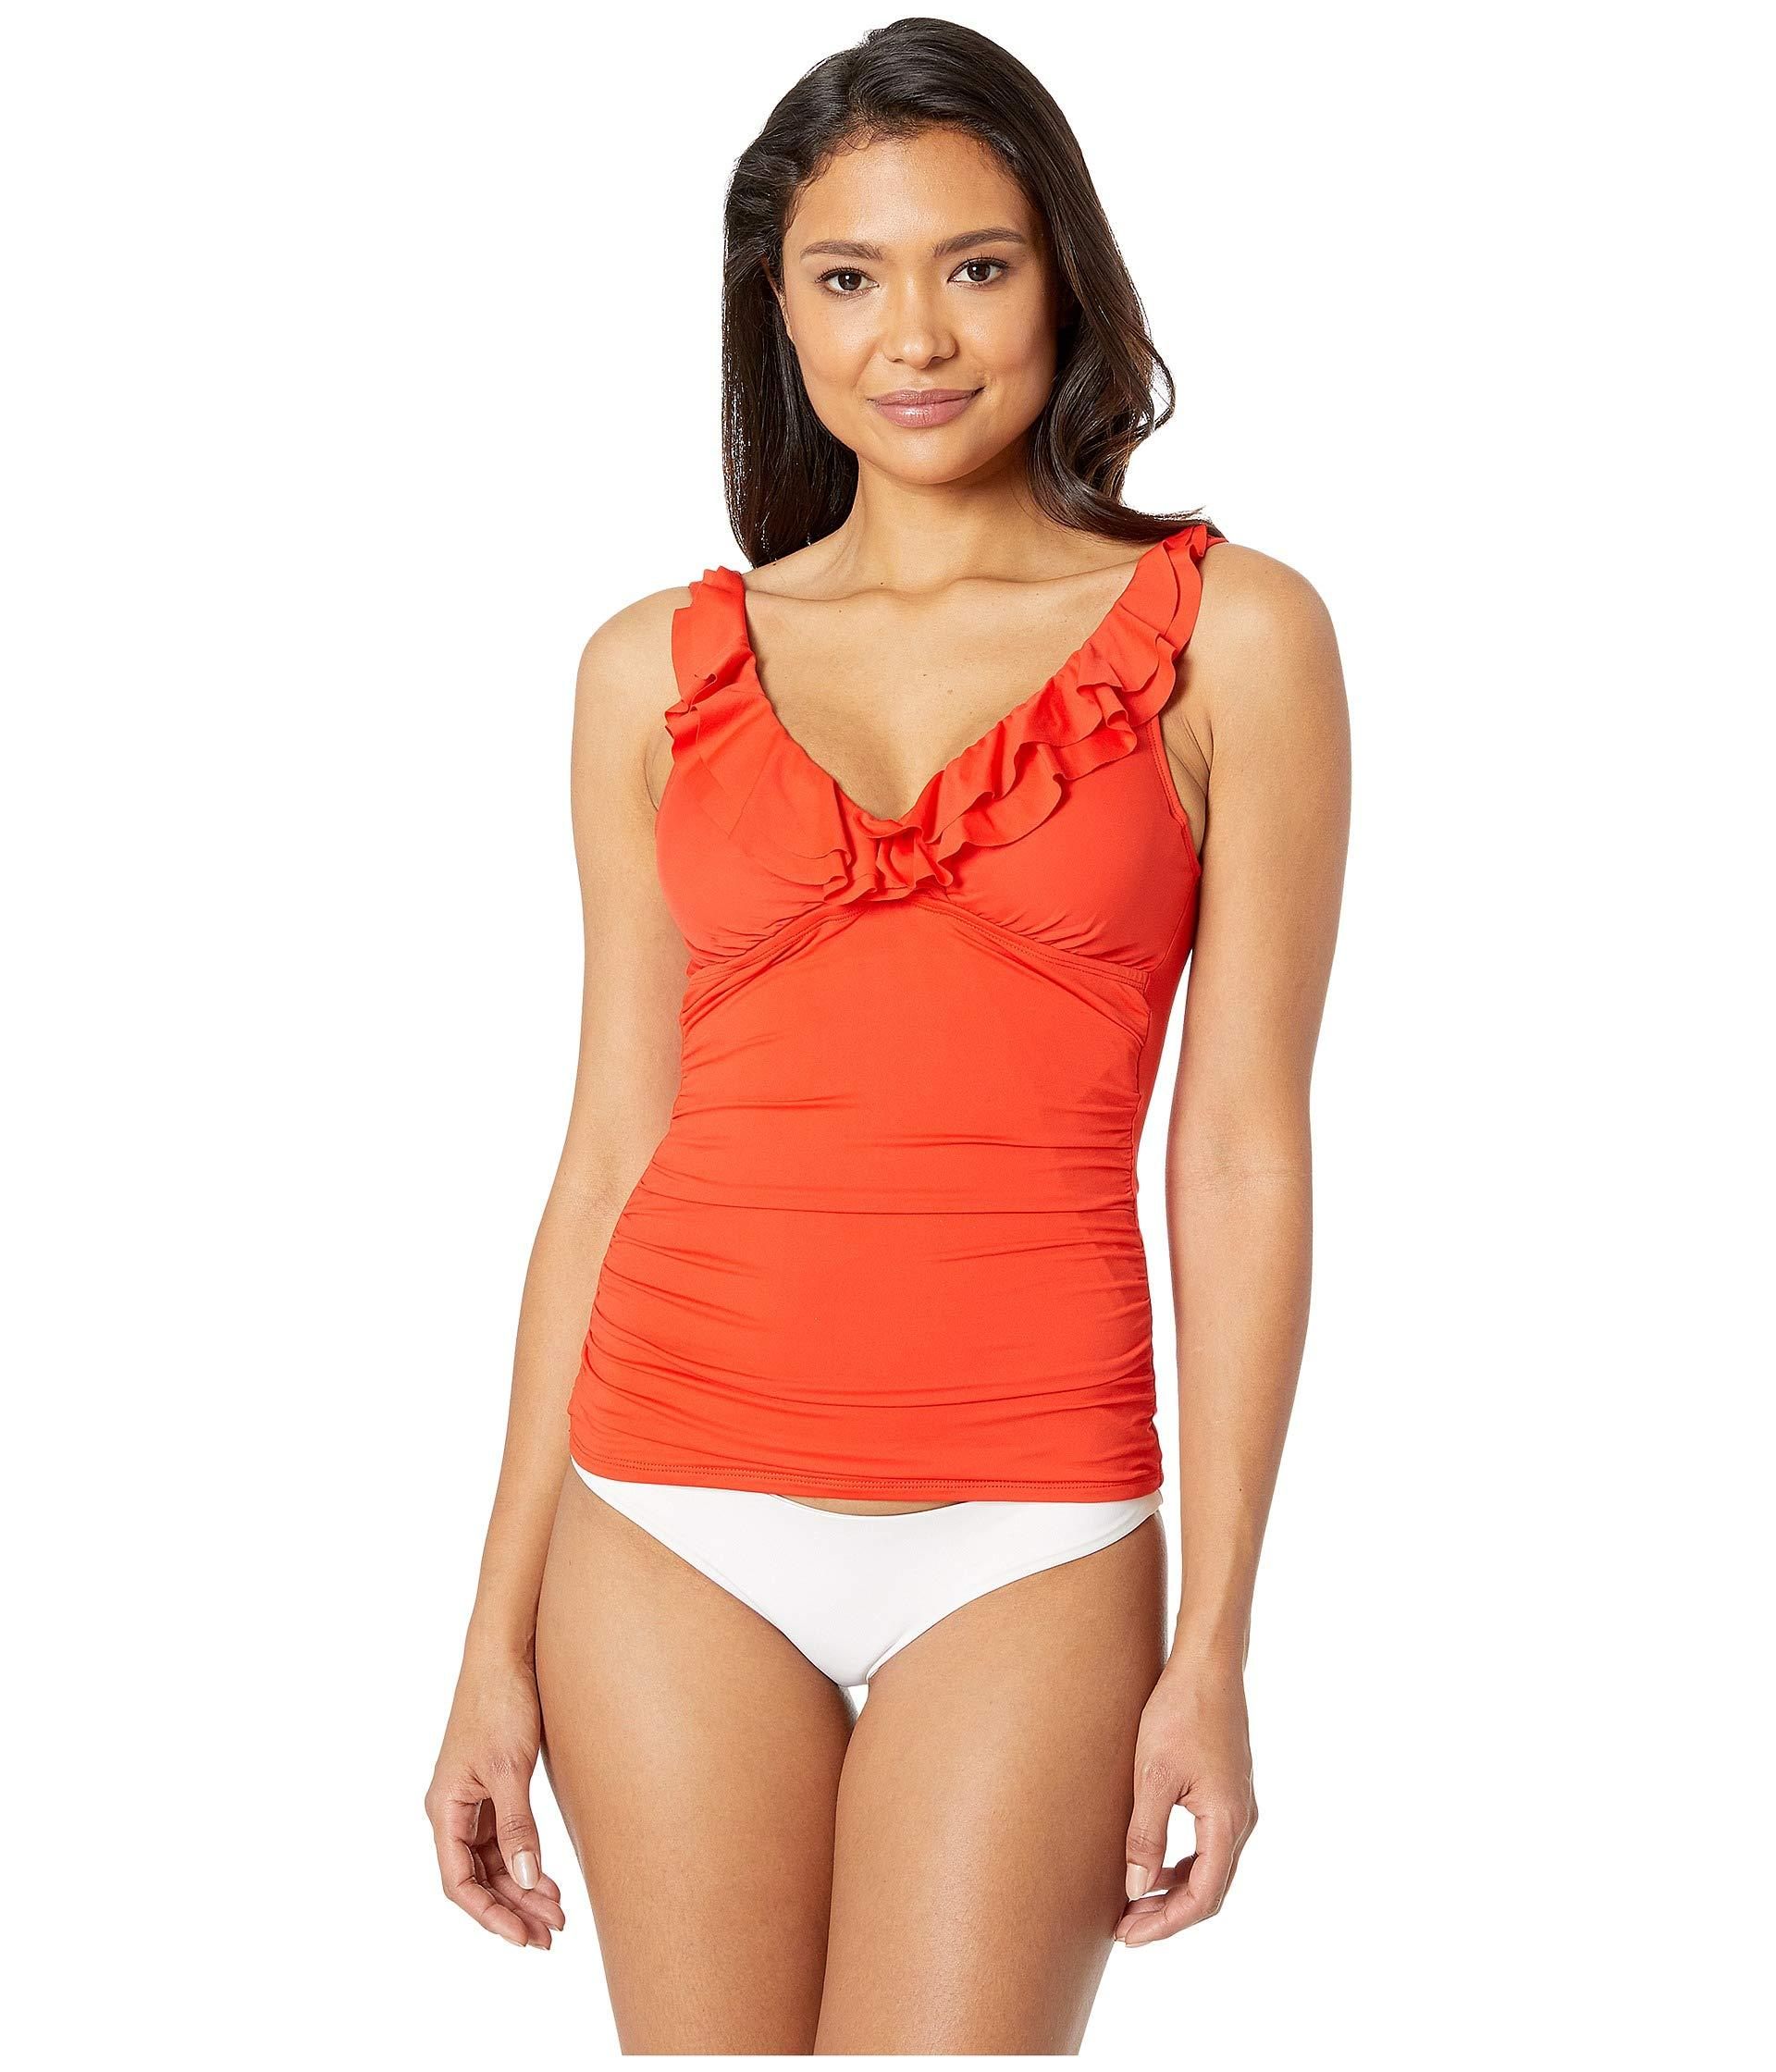 8d01e2c7f7096 Lauren by Ralph Lauren. Women s Red Beach Club Solids Ruffle Underwire  Tankini Top